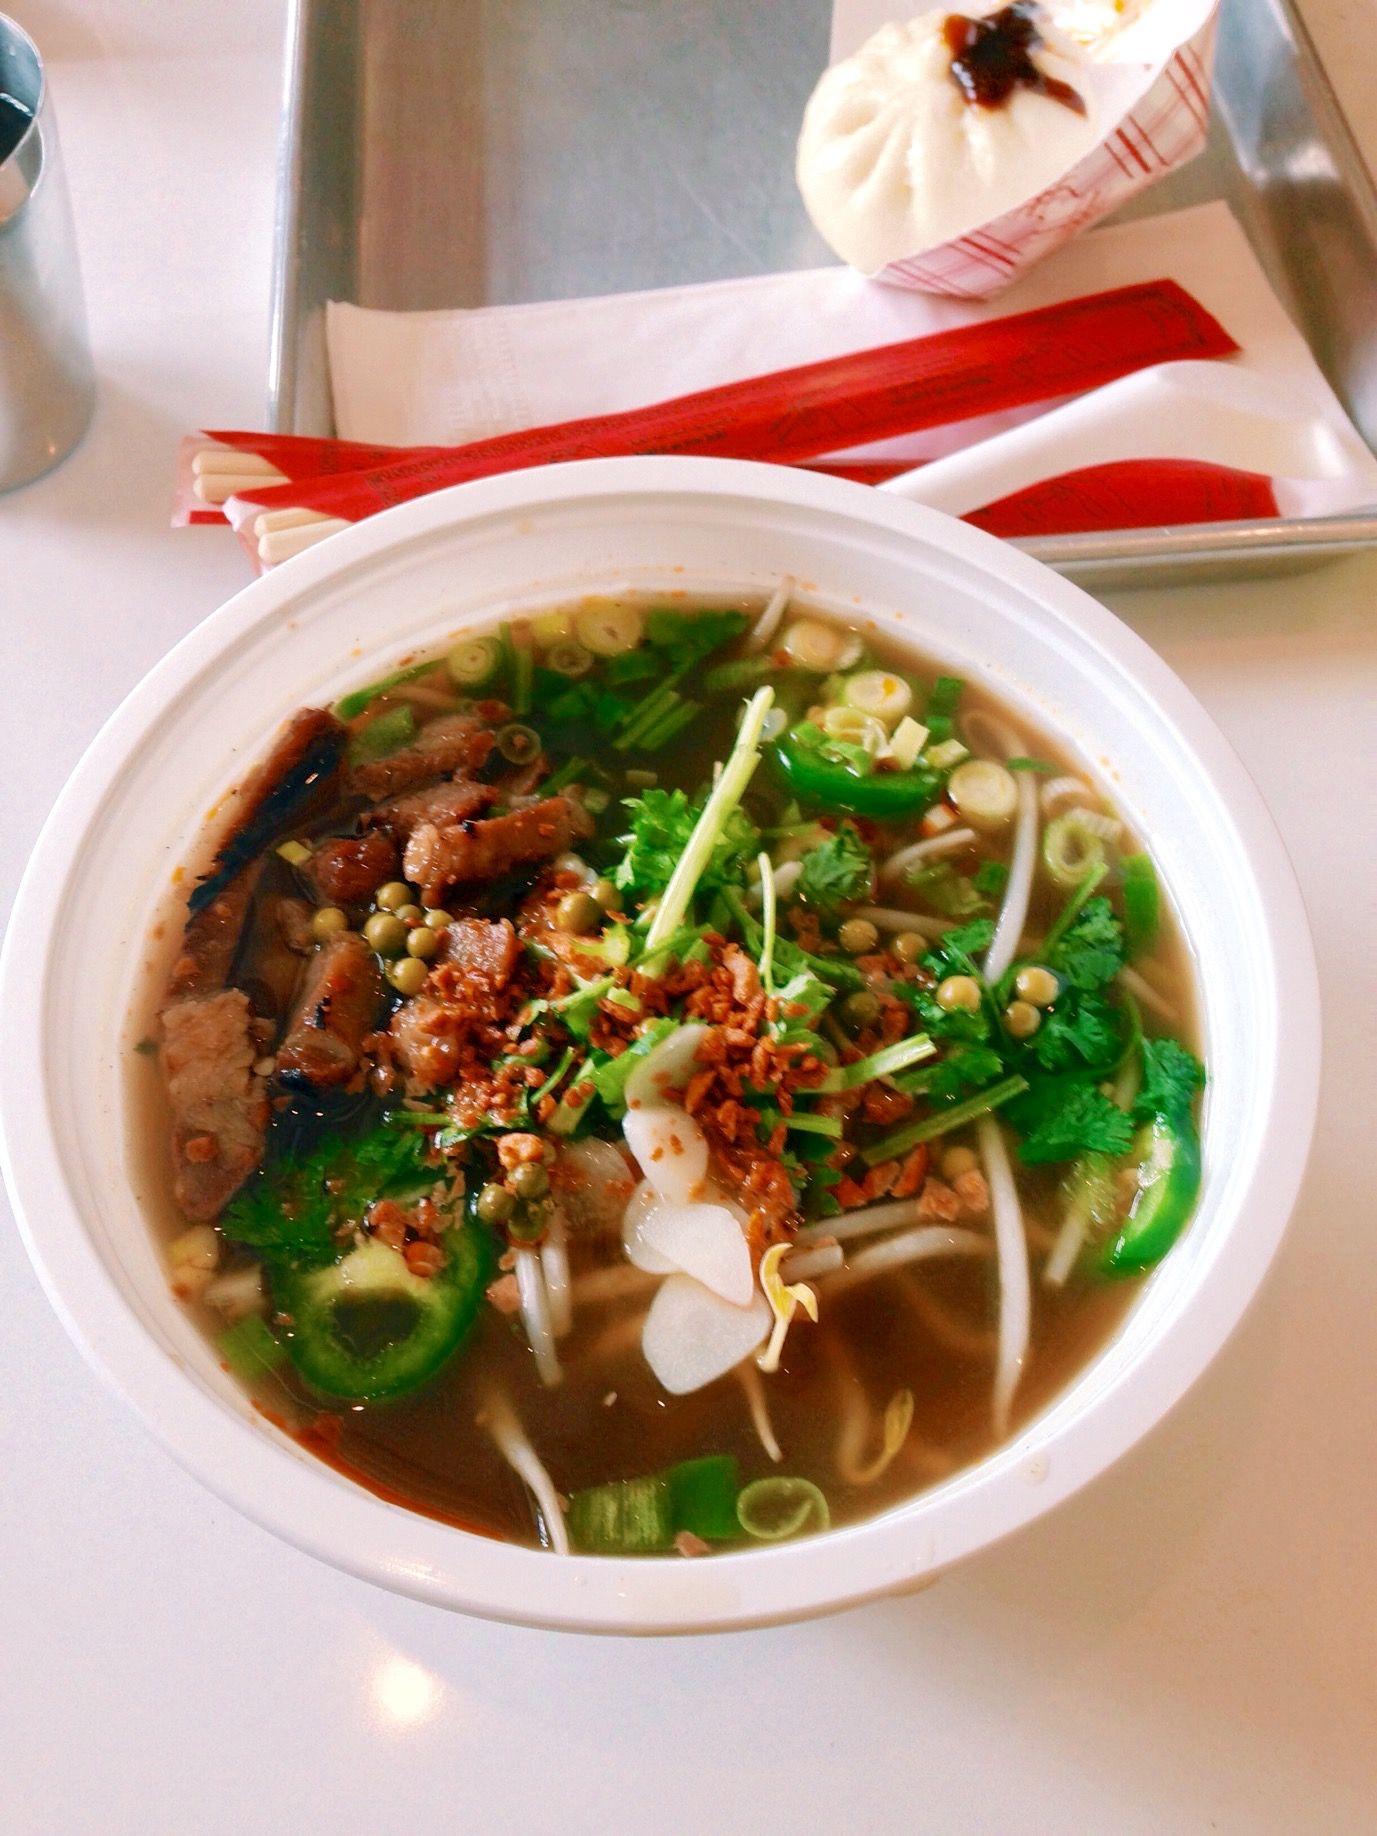 Maketto DC | Cambodian Pork Noodle Soup | Delicious  http://maketto1351.com/